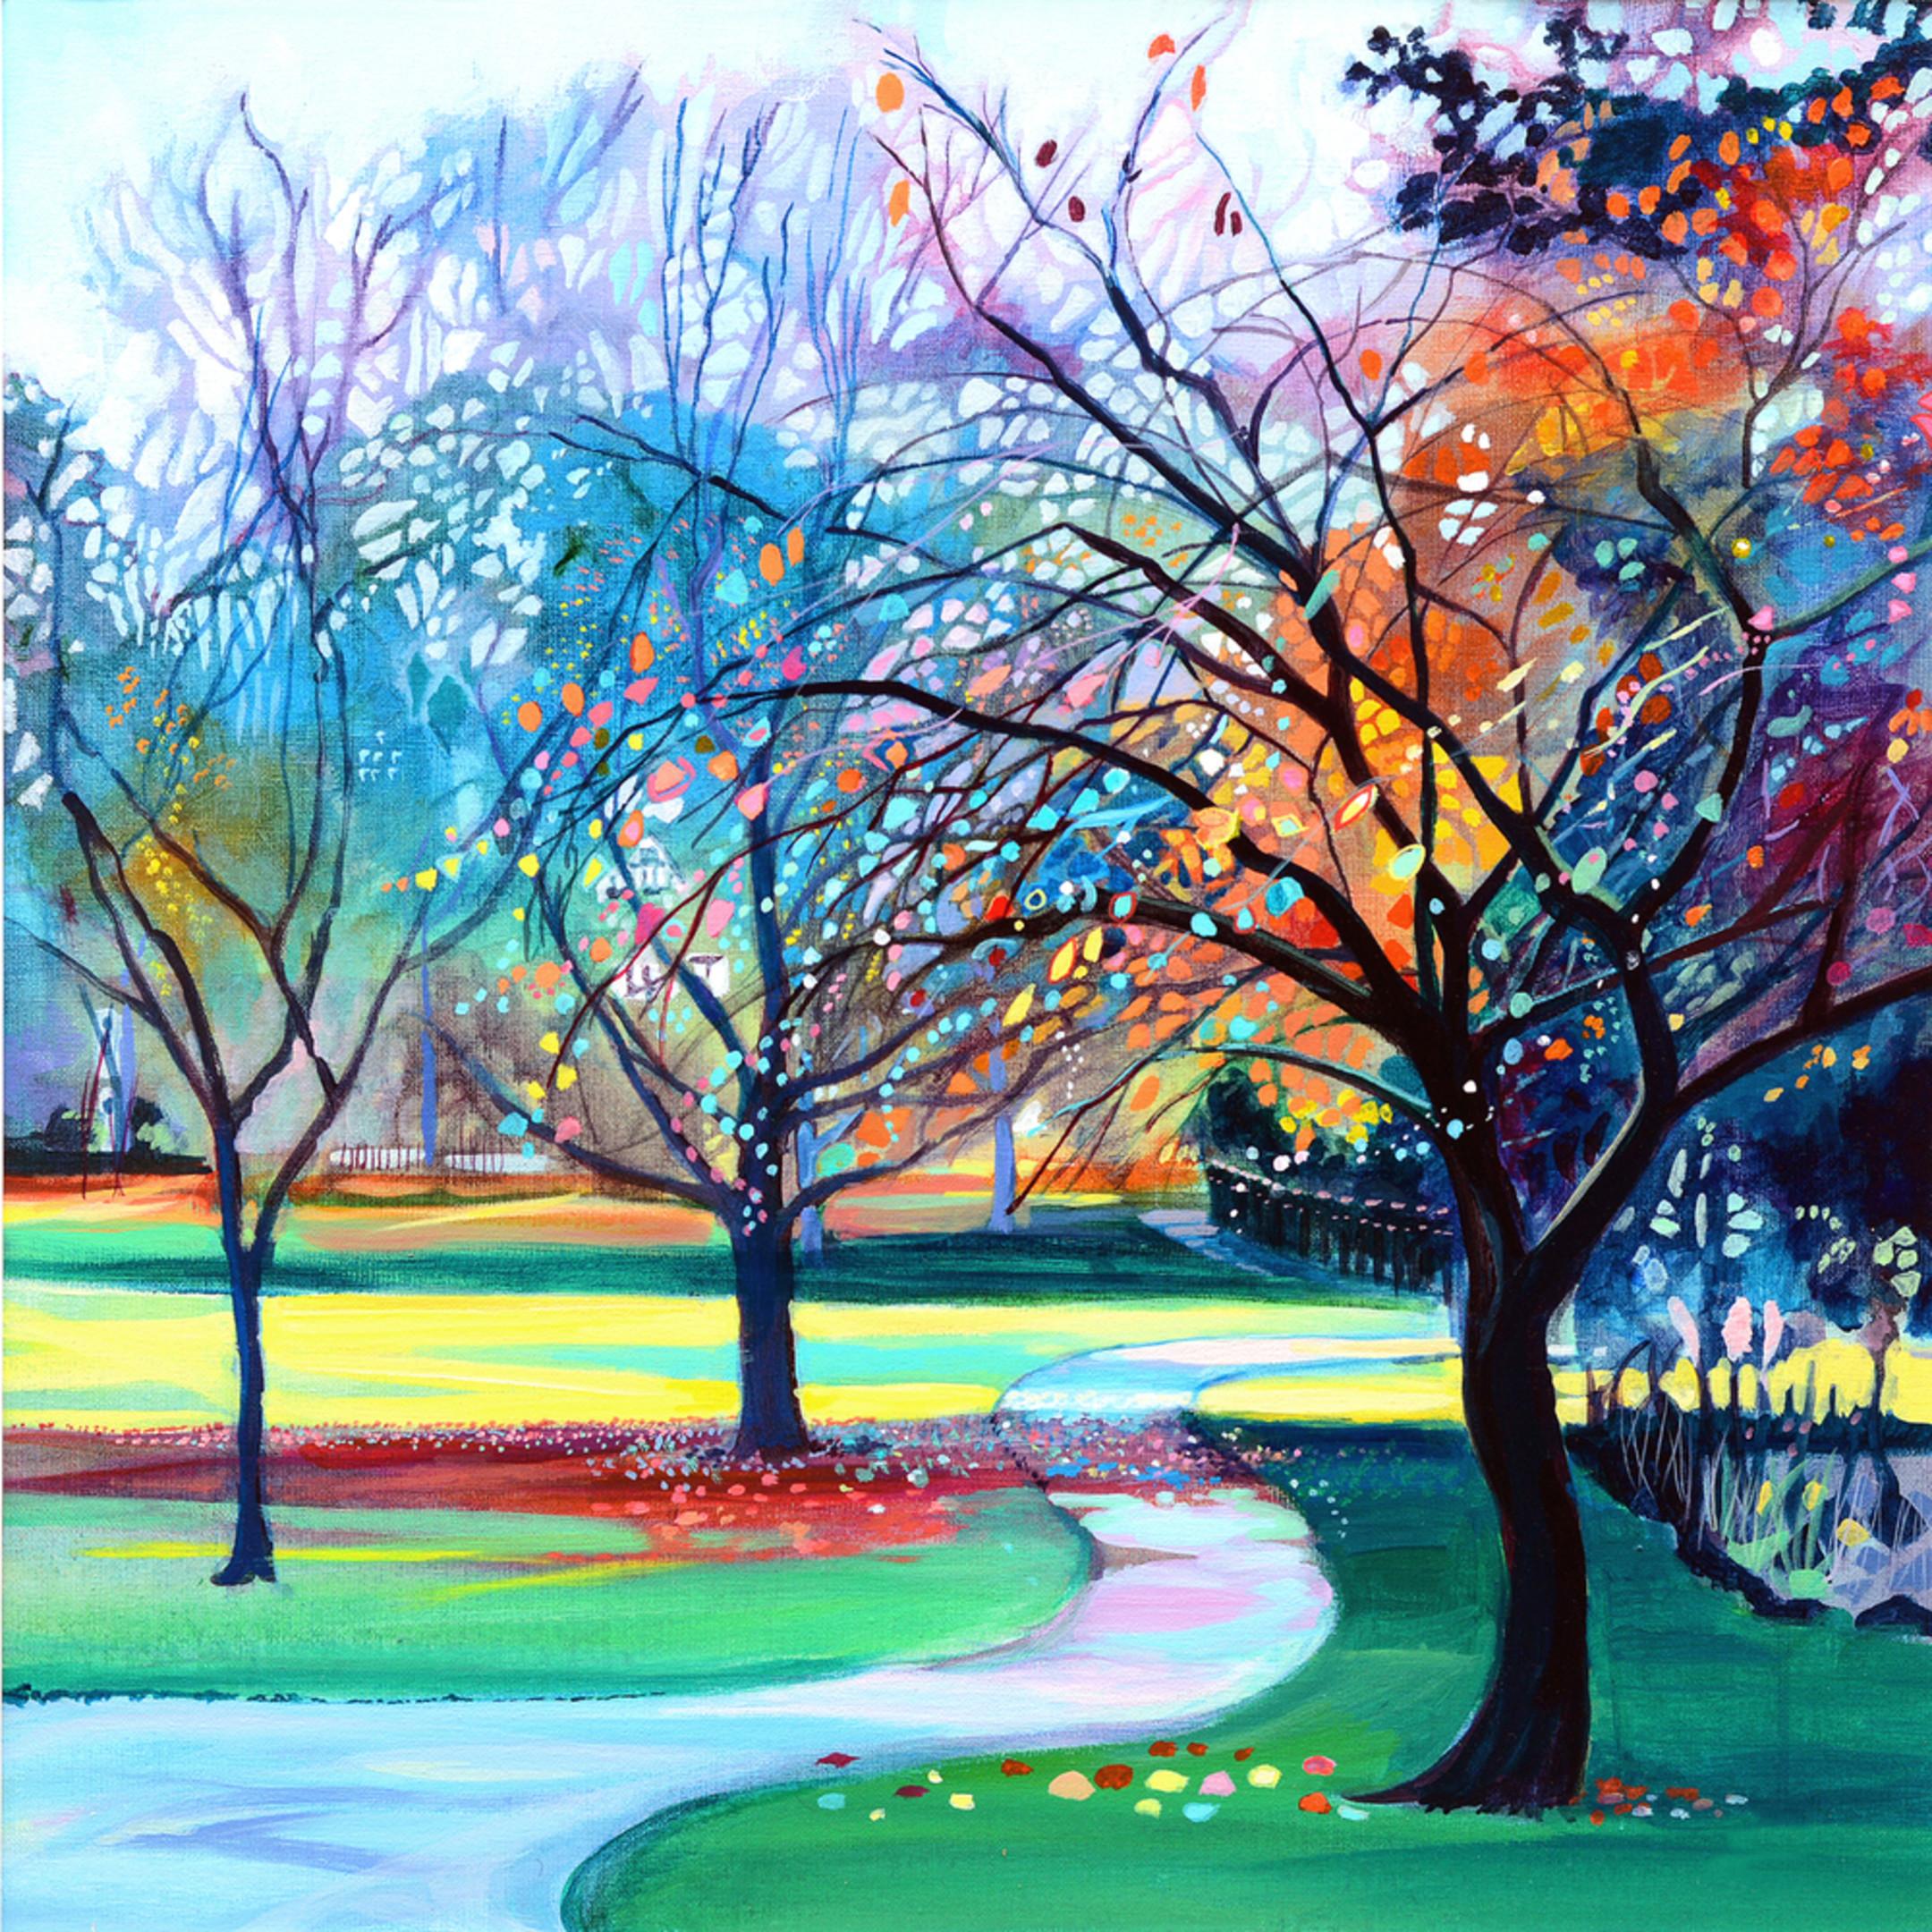 Autumn glory emwvle